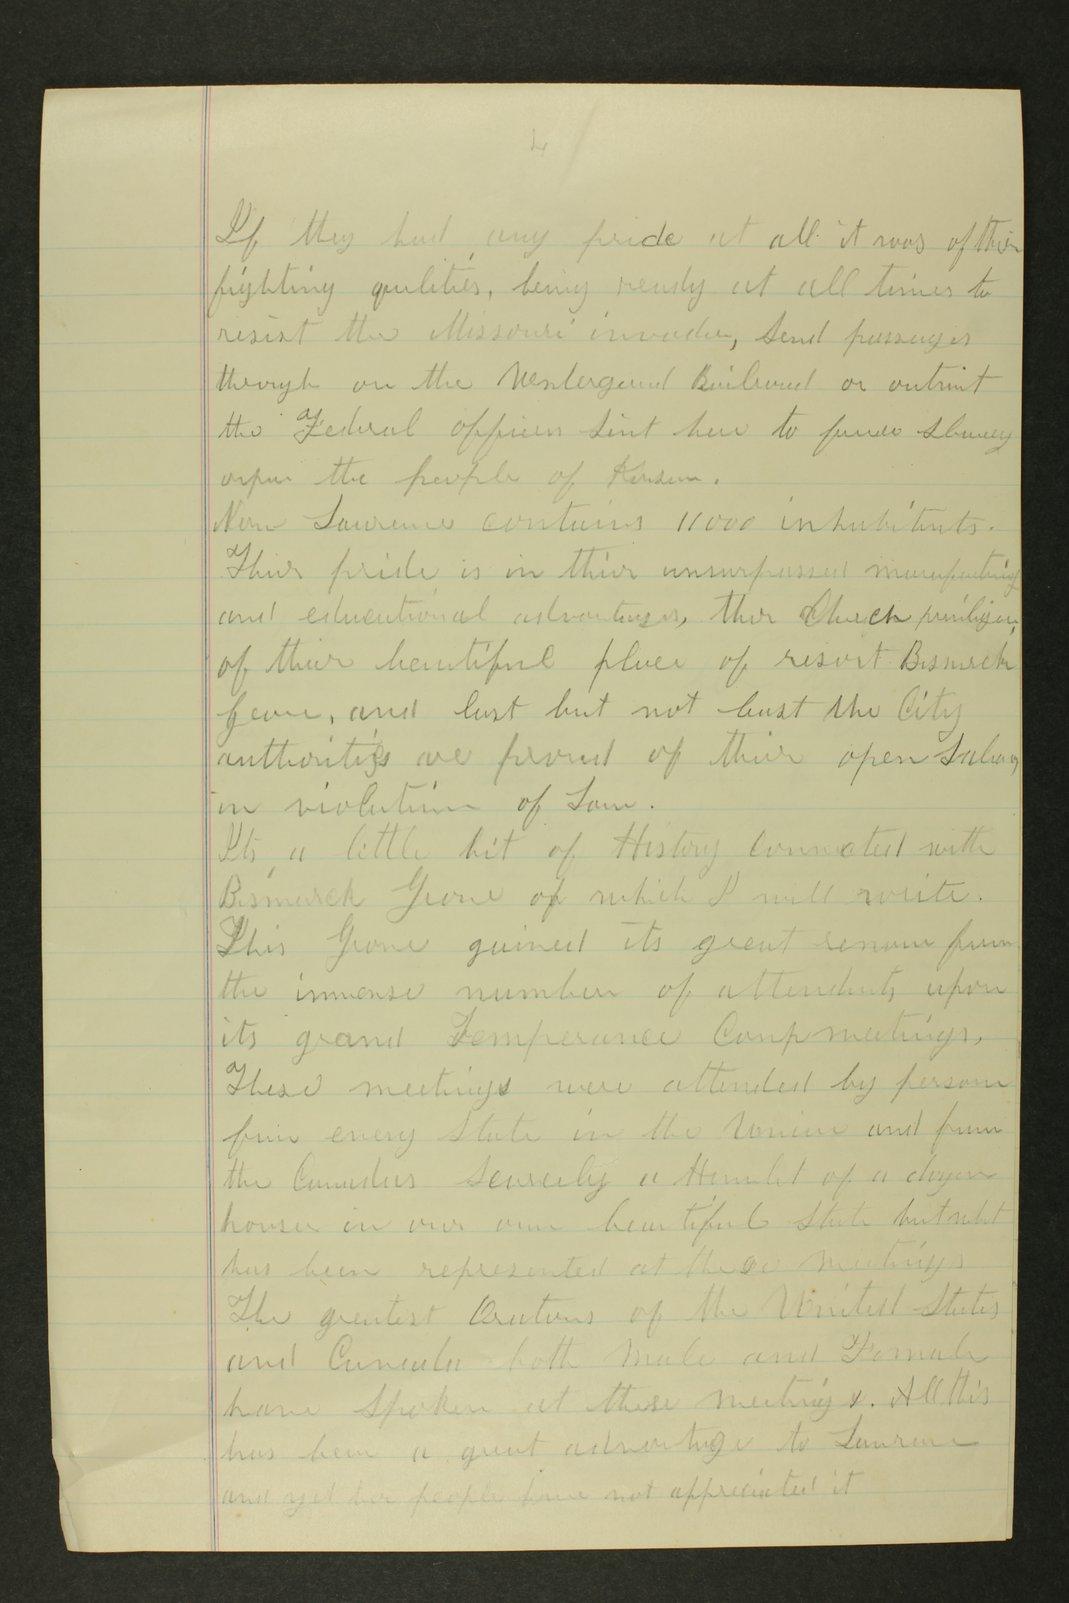 Temperance history correspondence - 10